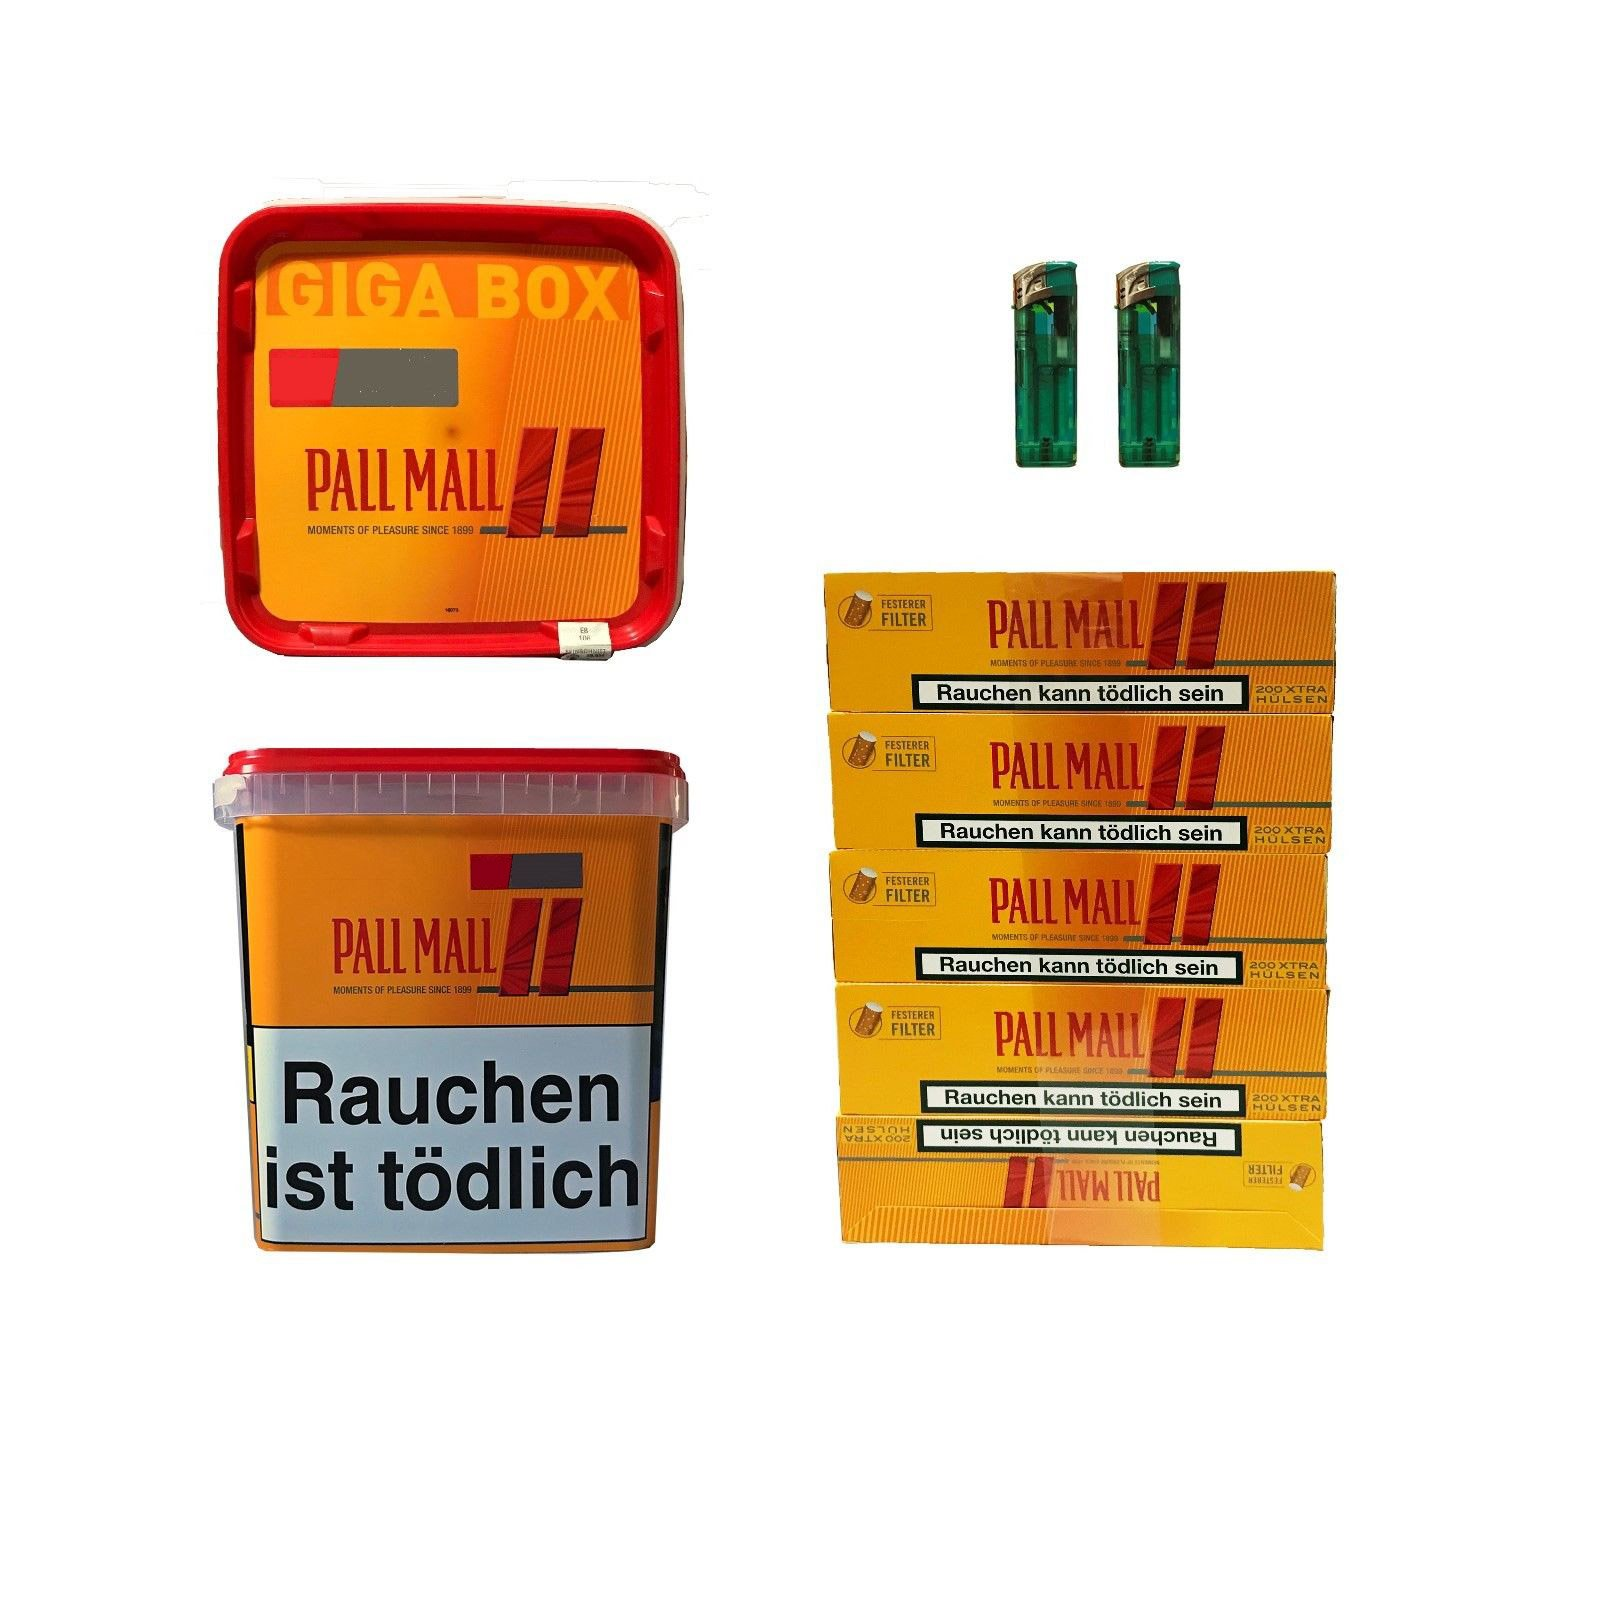 2x Pall Mall Allround Volumentabak Giga Box 280g, 1000 Extra Hülsen, 2 Feuerz.